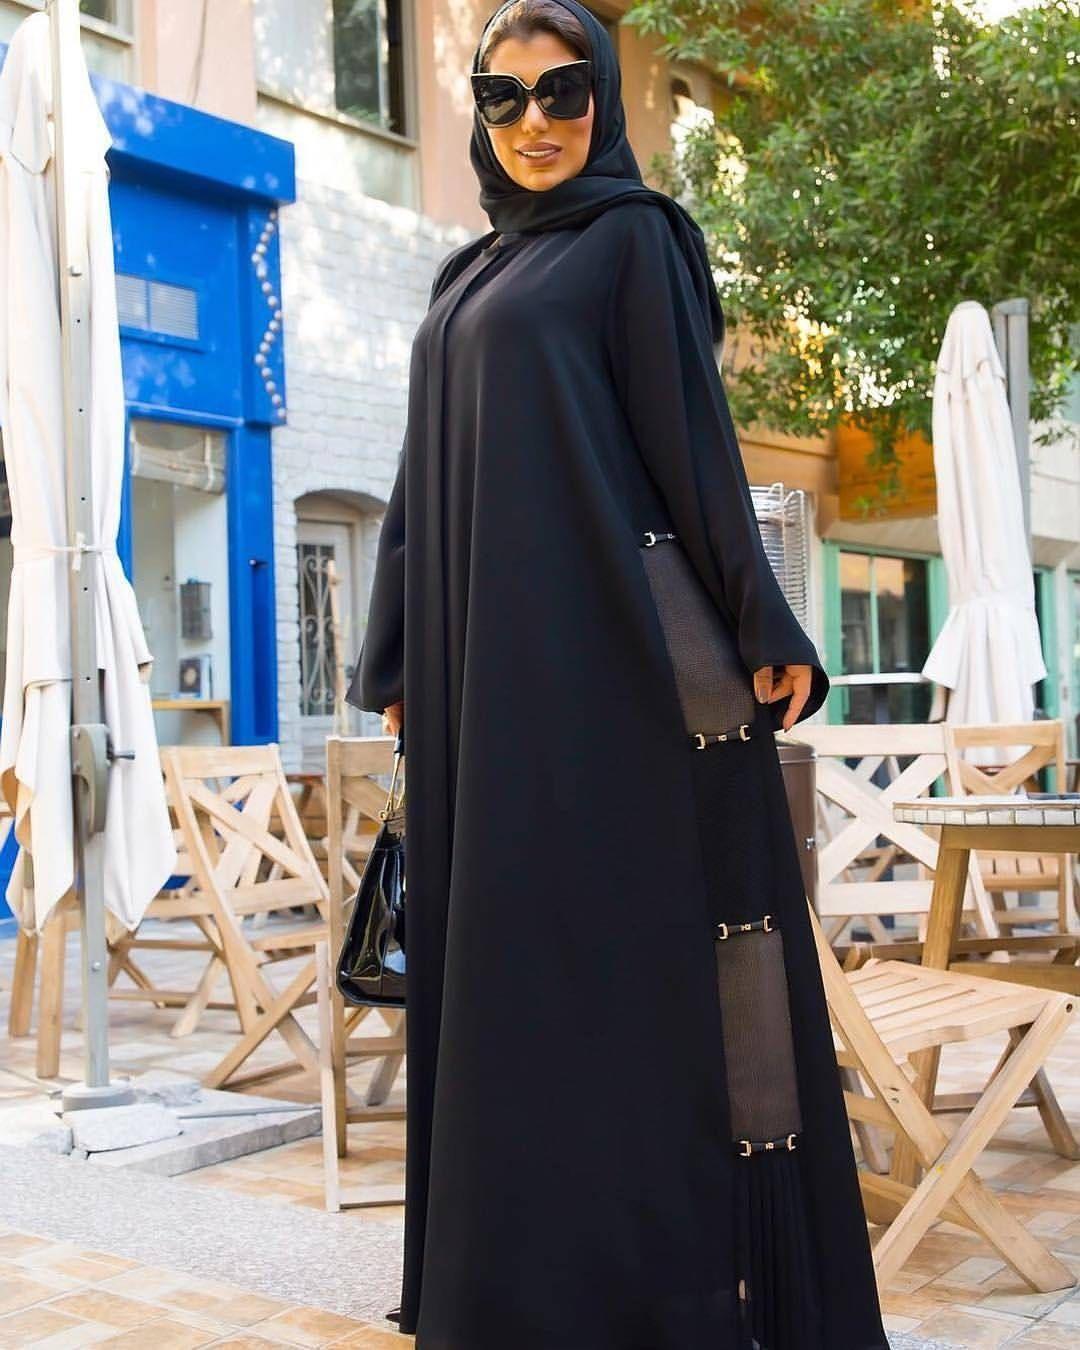 Repost Lifesunlinda Model With Instatoolsapp New Looks Subhanabayas ازياء عبايات عباية أناقة Fashionblog Insta Fashion Fashion Abaya Fashion